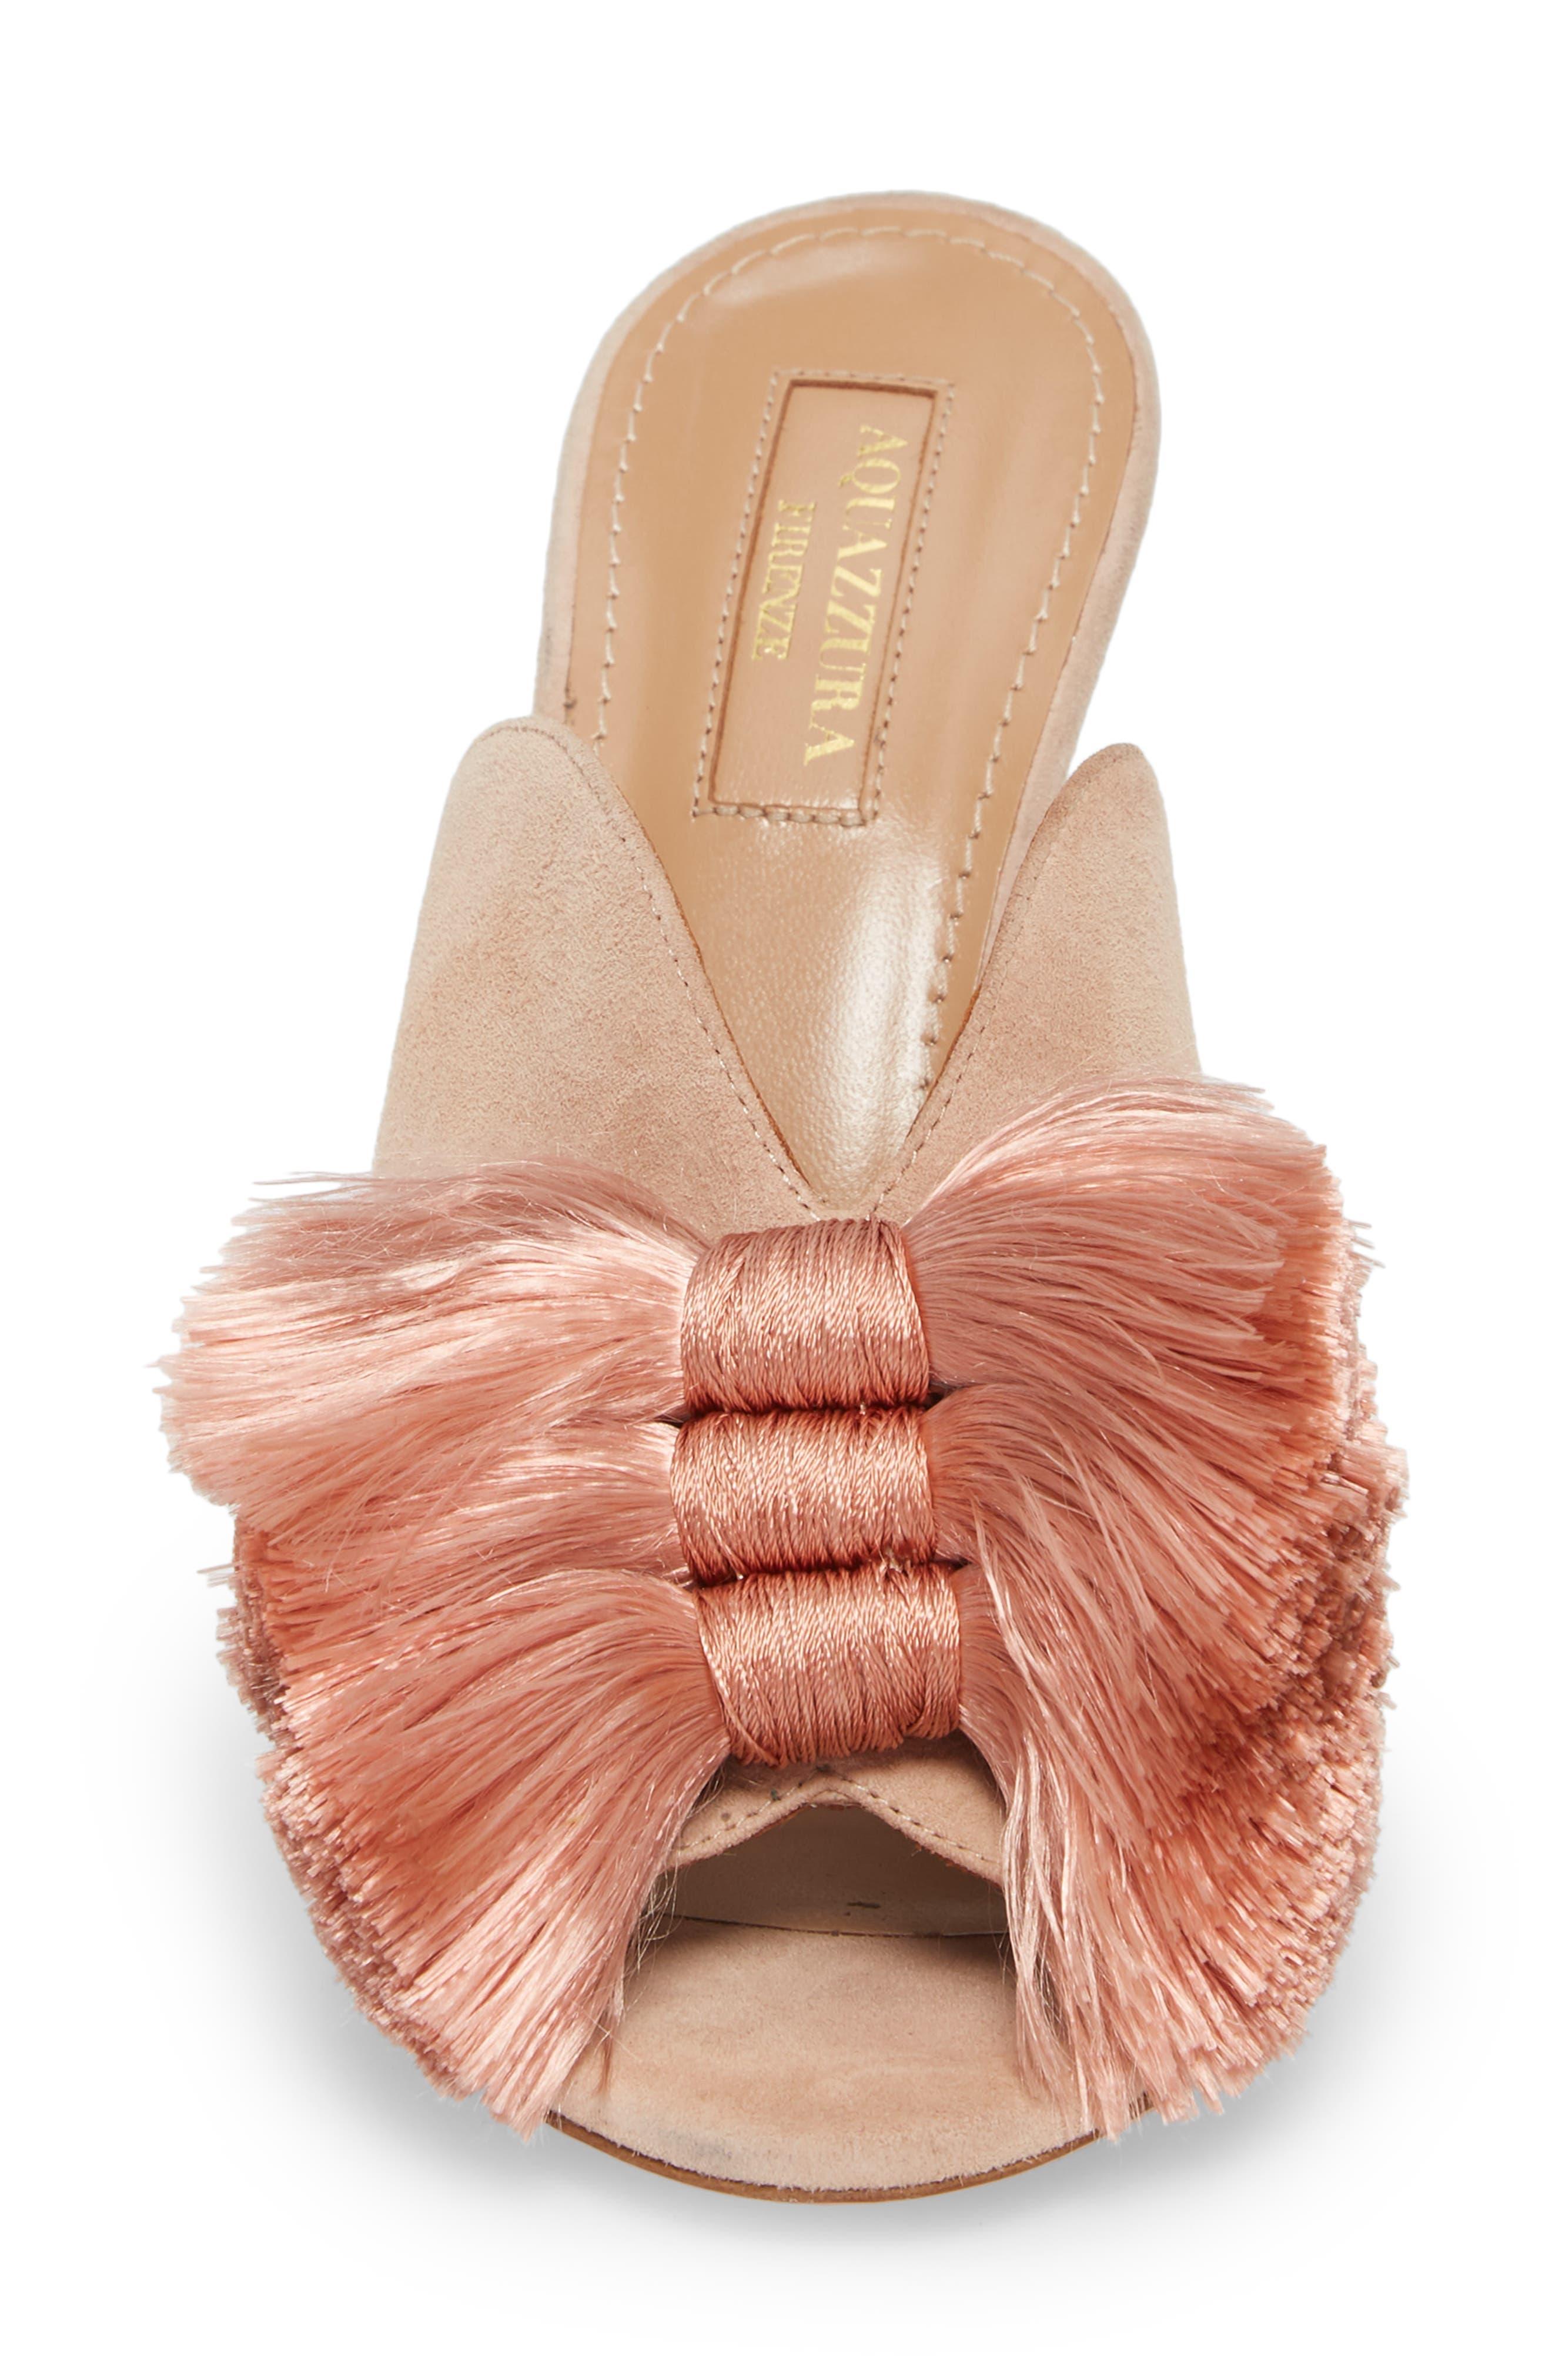 Lotus Blossom Mule Sandal,                             Alternate thumbnail 4, color,                             651